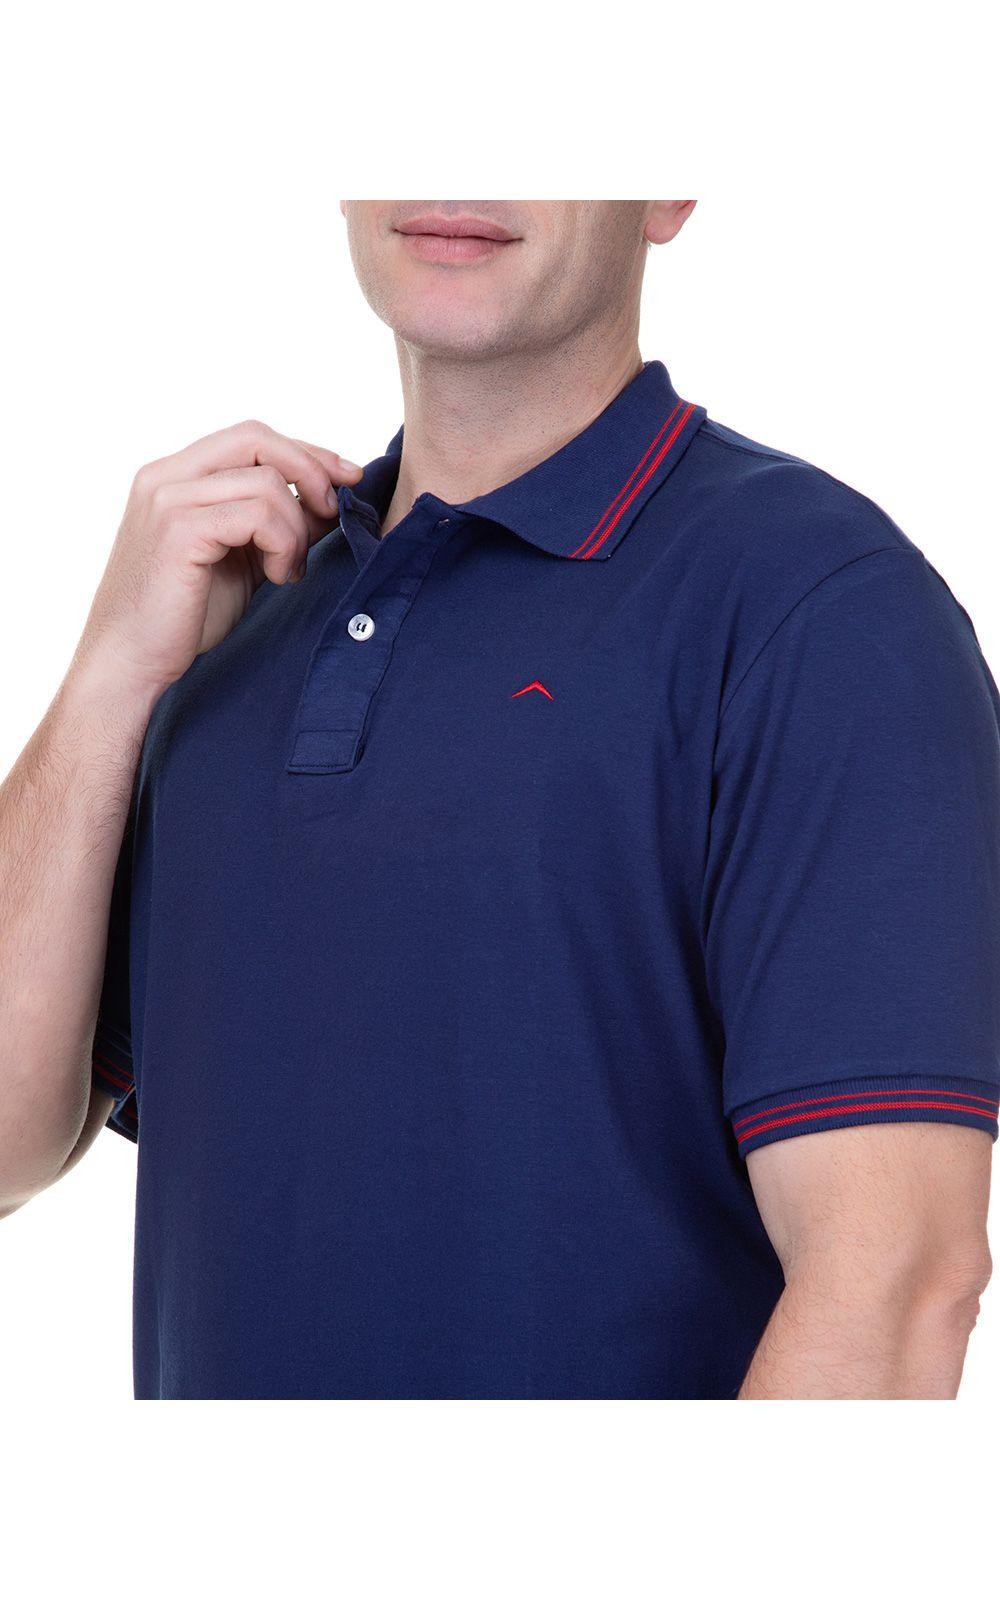 Foto 3 - Camisa Polo Masculina Azul Marinho Detalhada